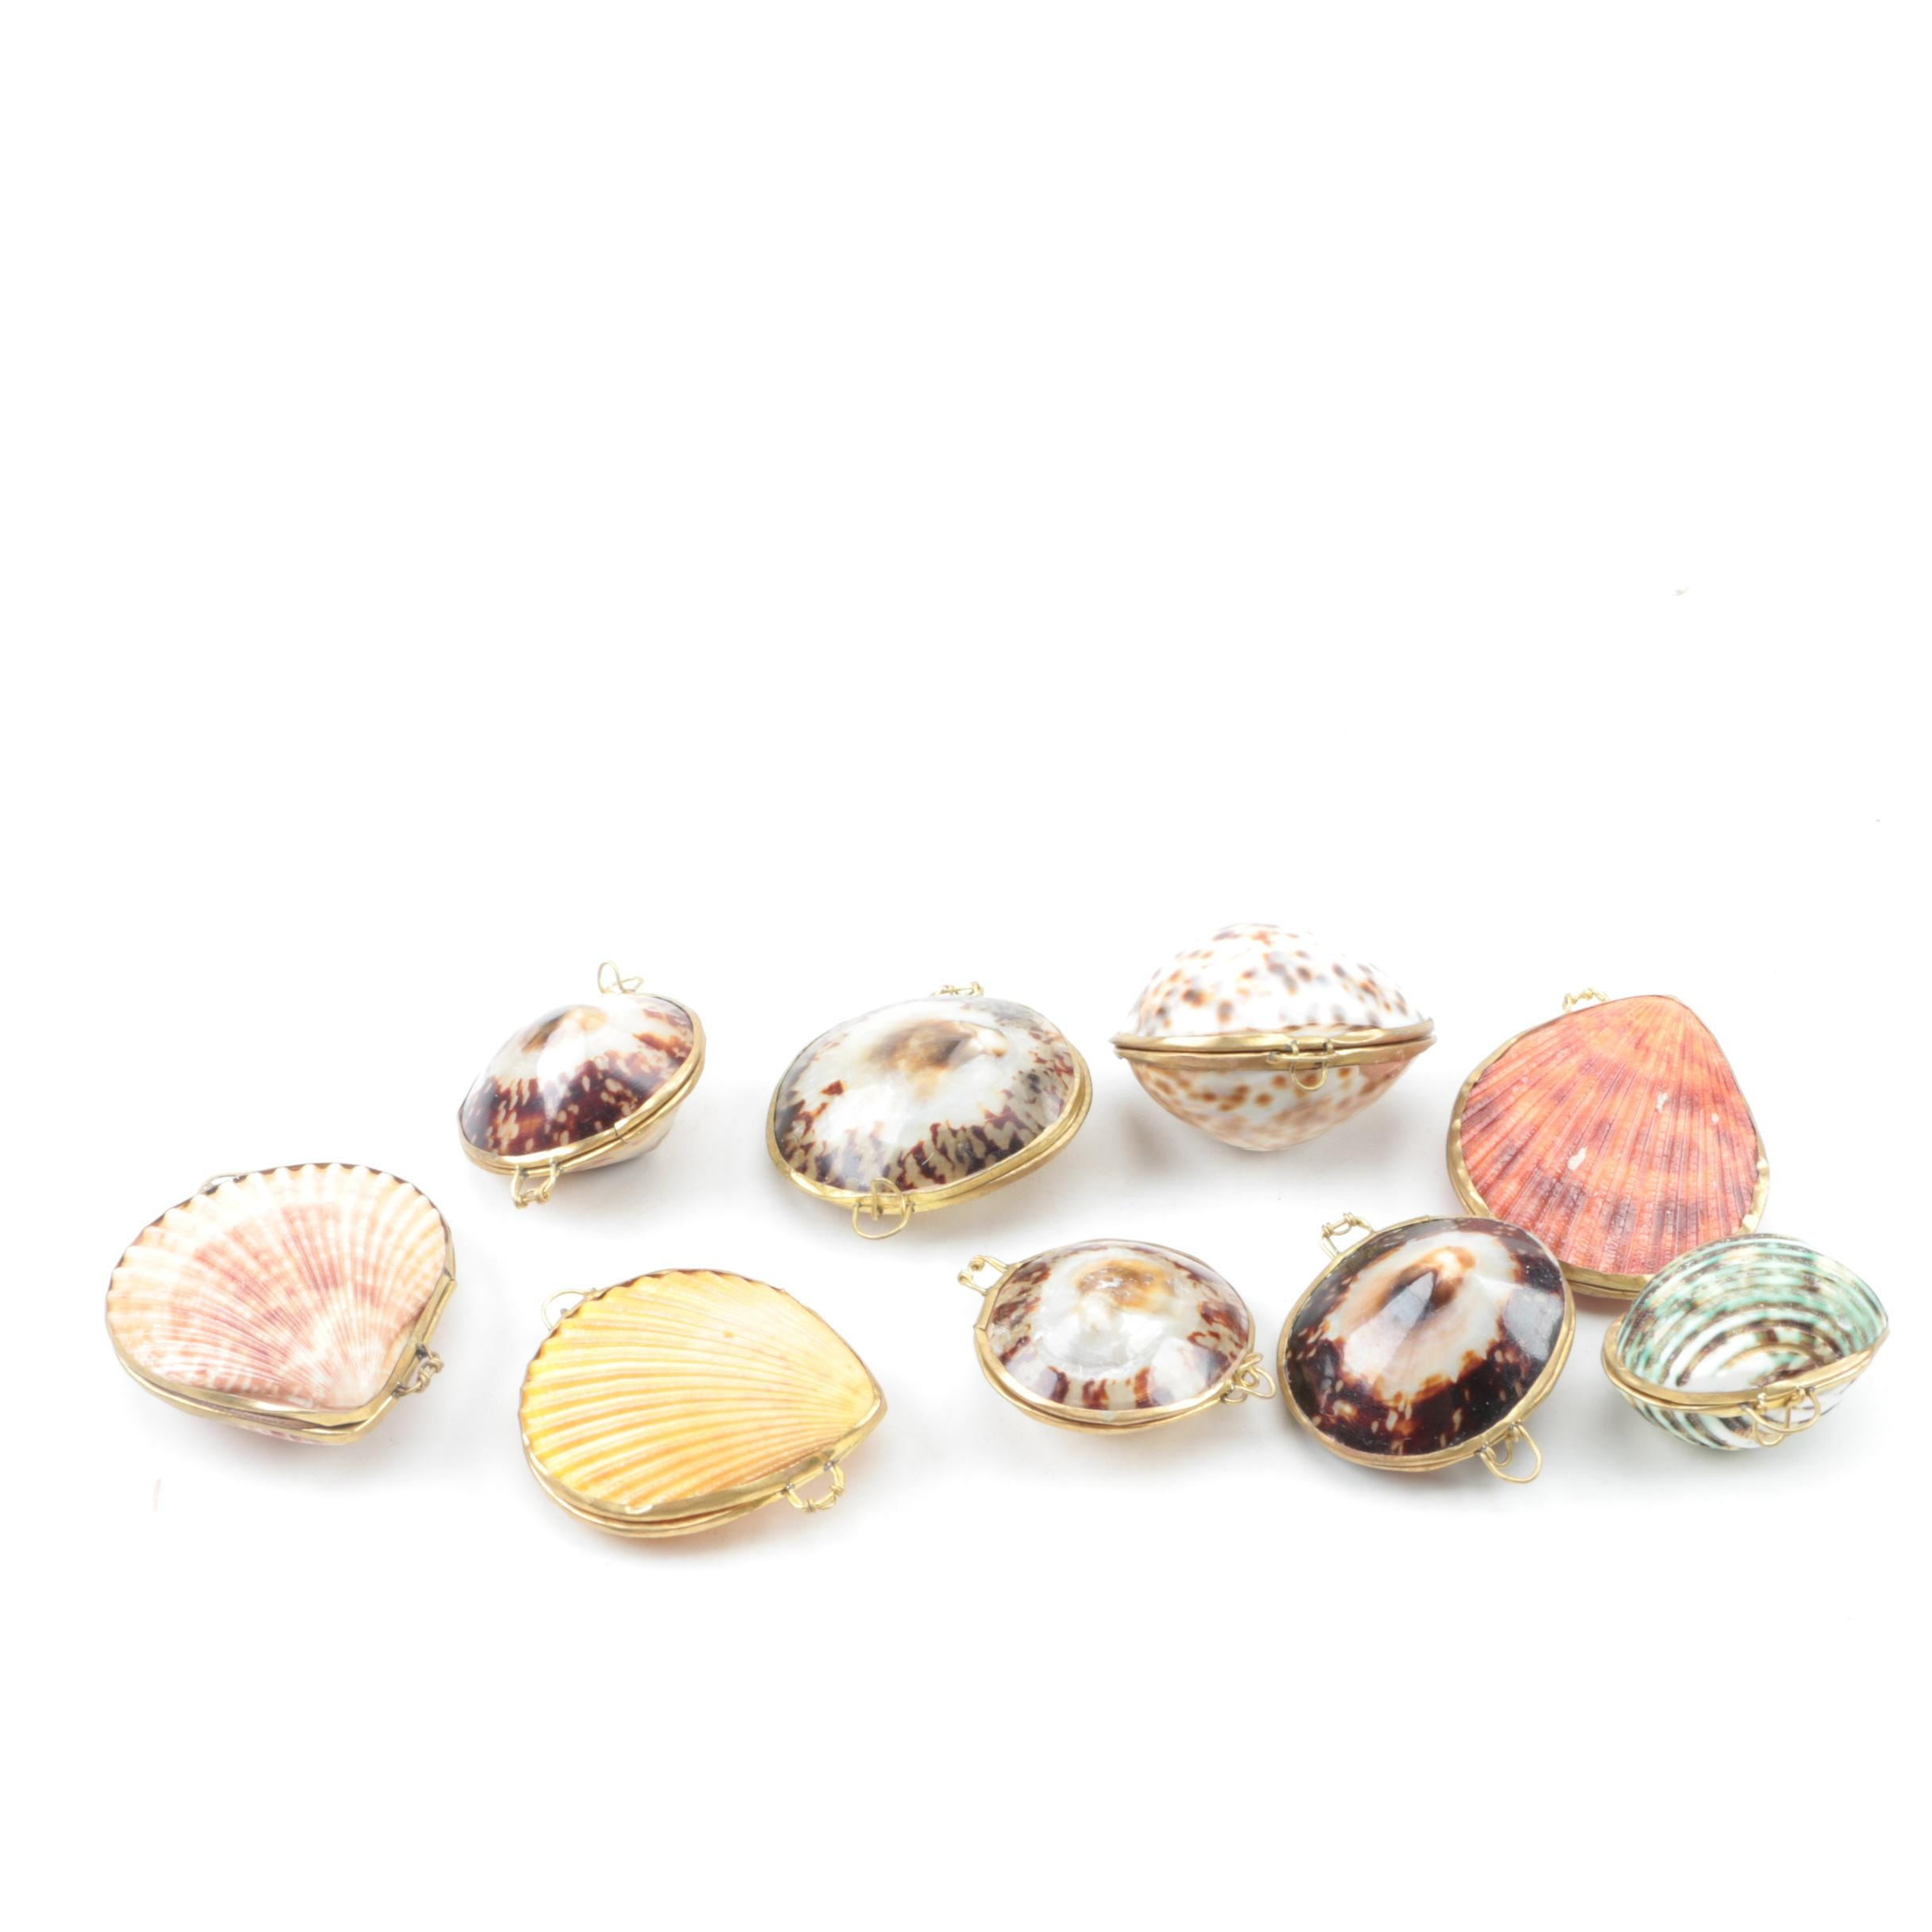 Group of Seashell Trinket Boxes